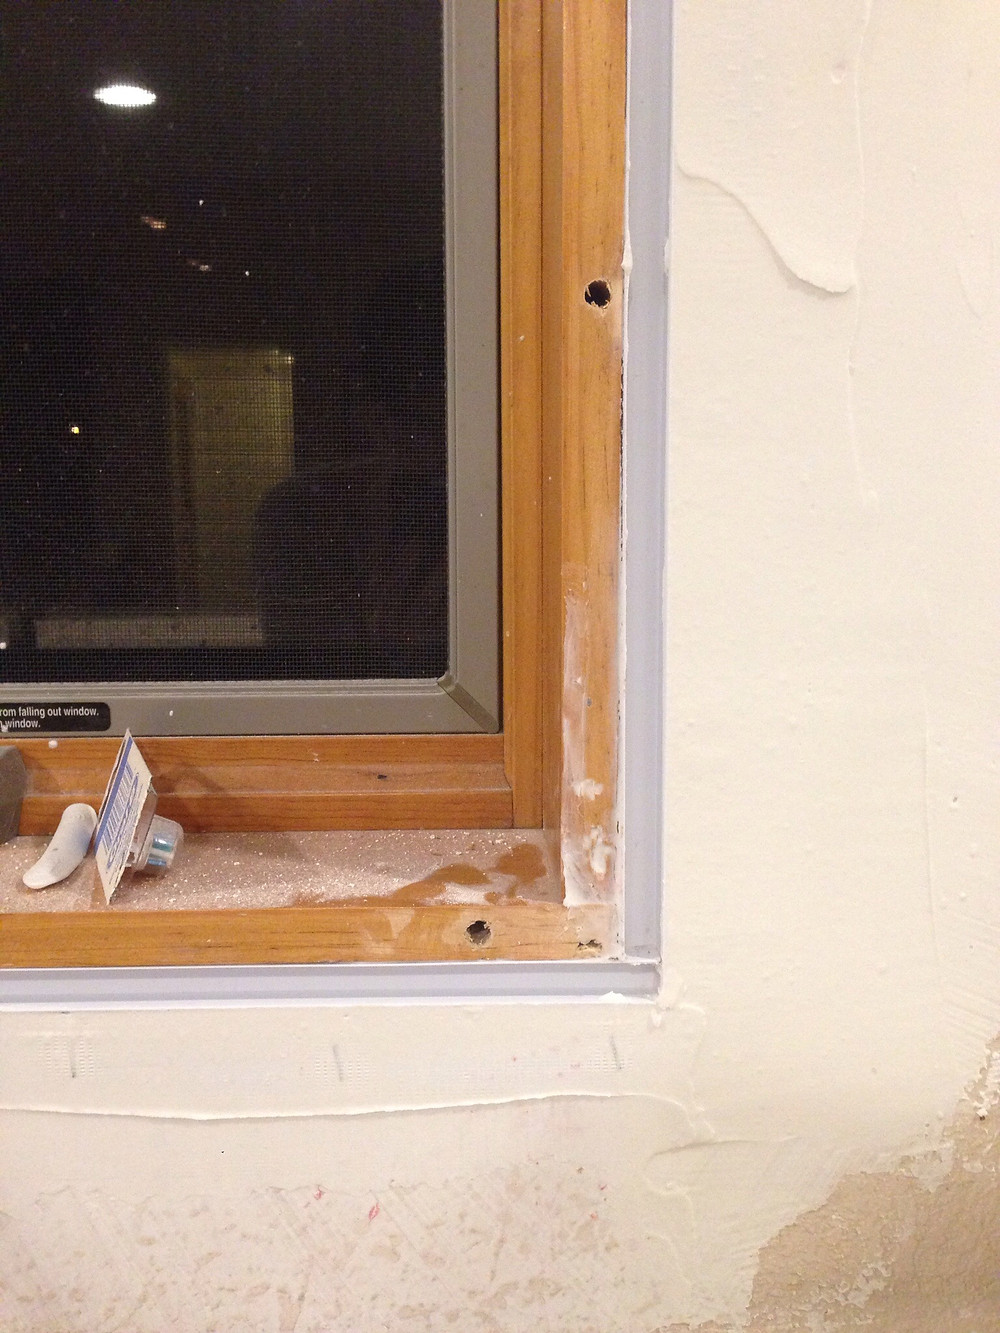 Trim-Tex F Reveal Bead window trim